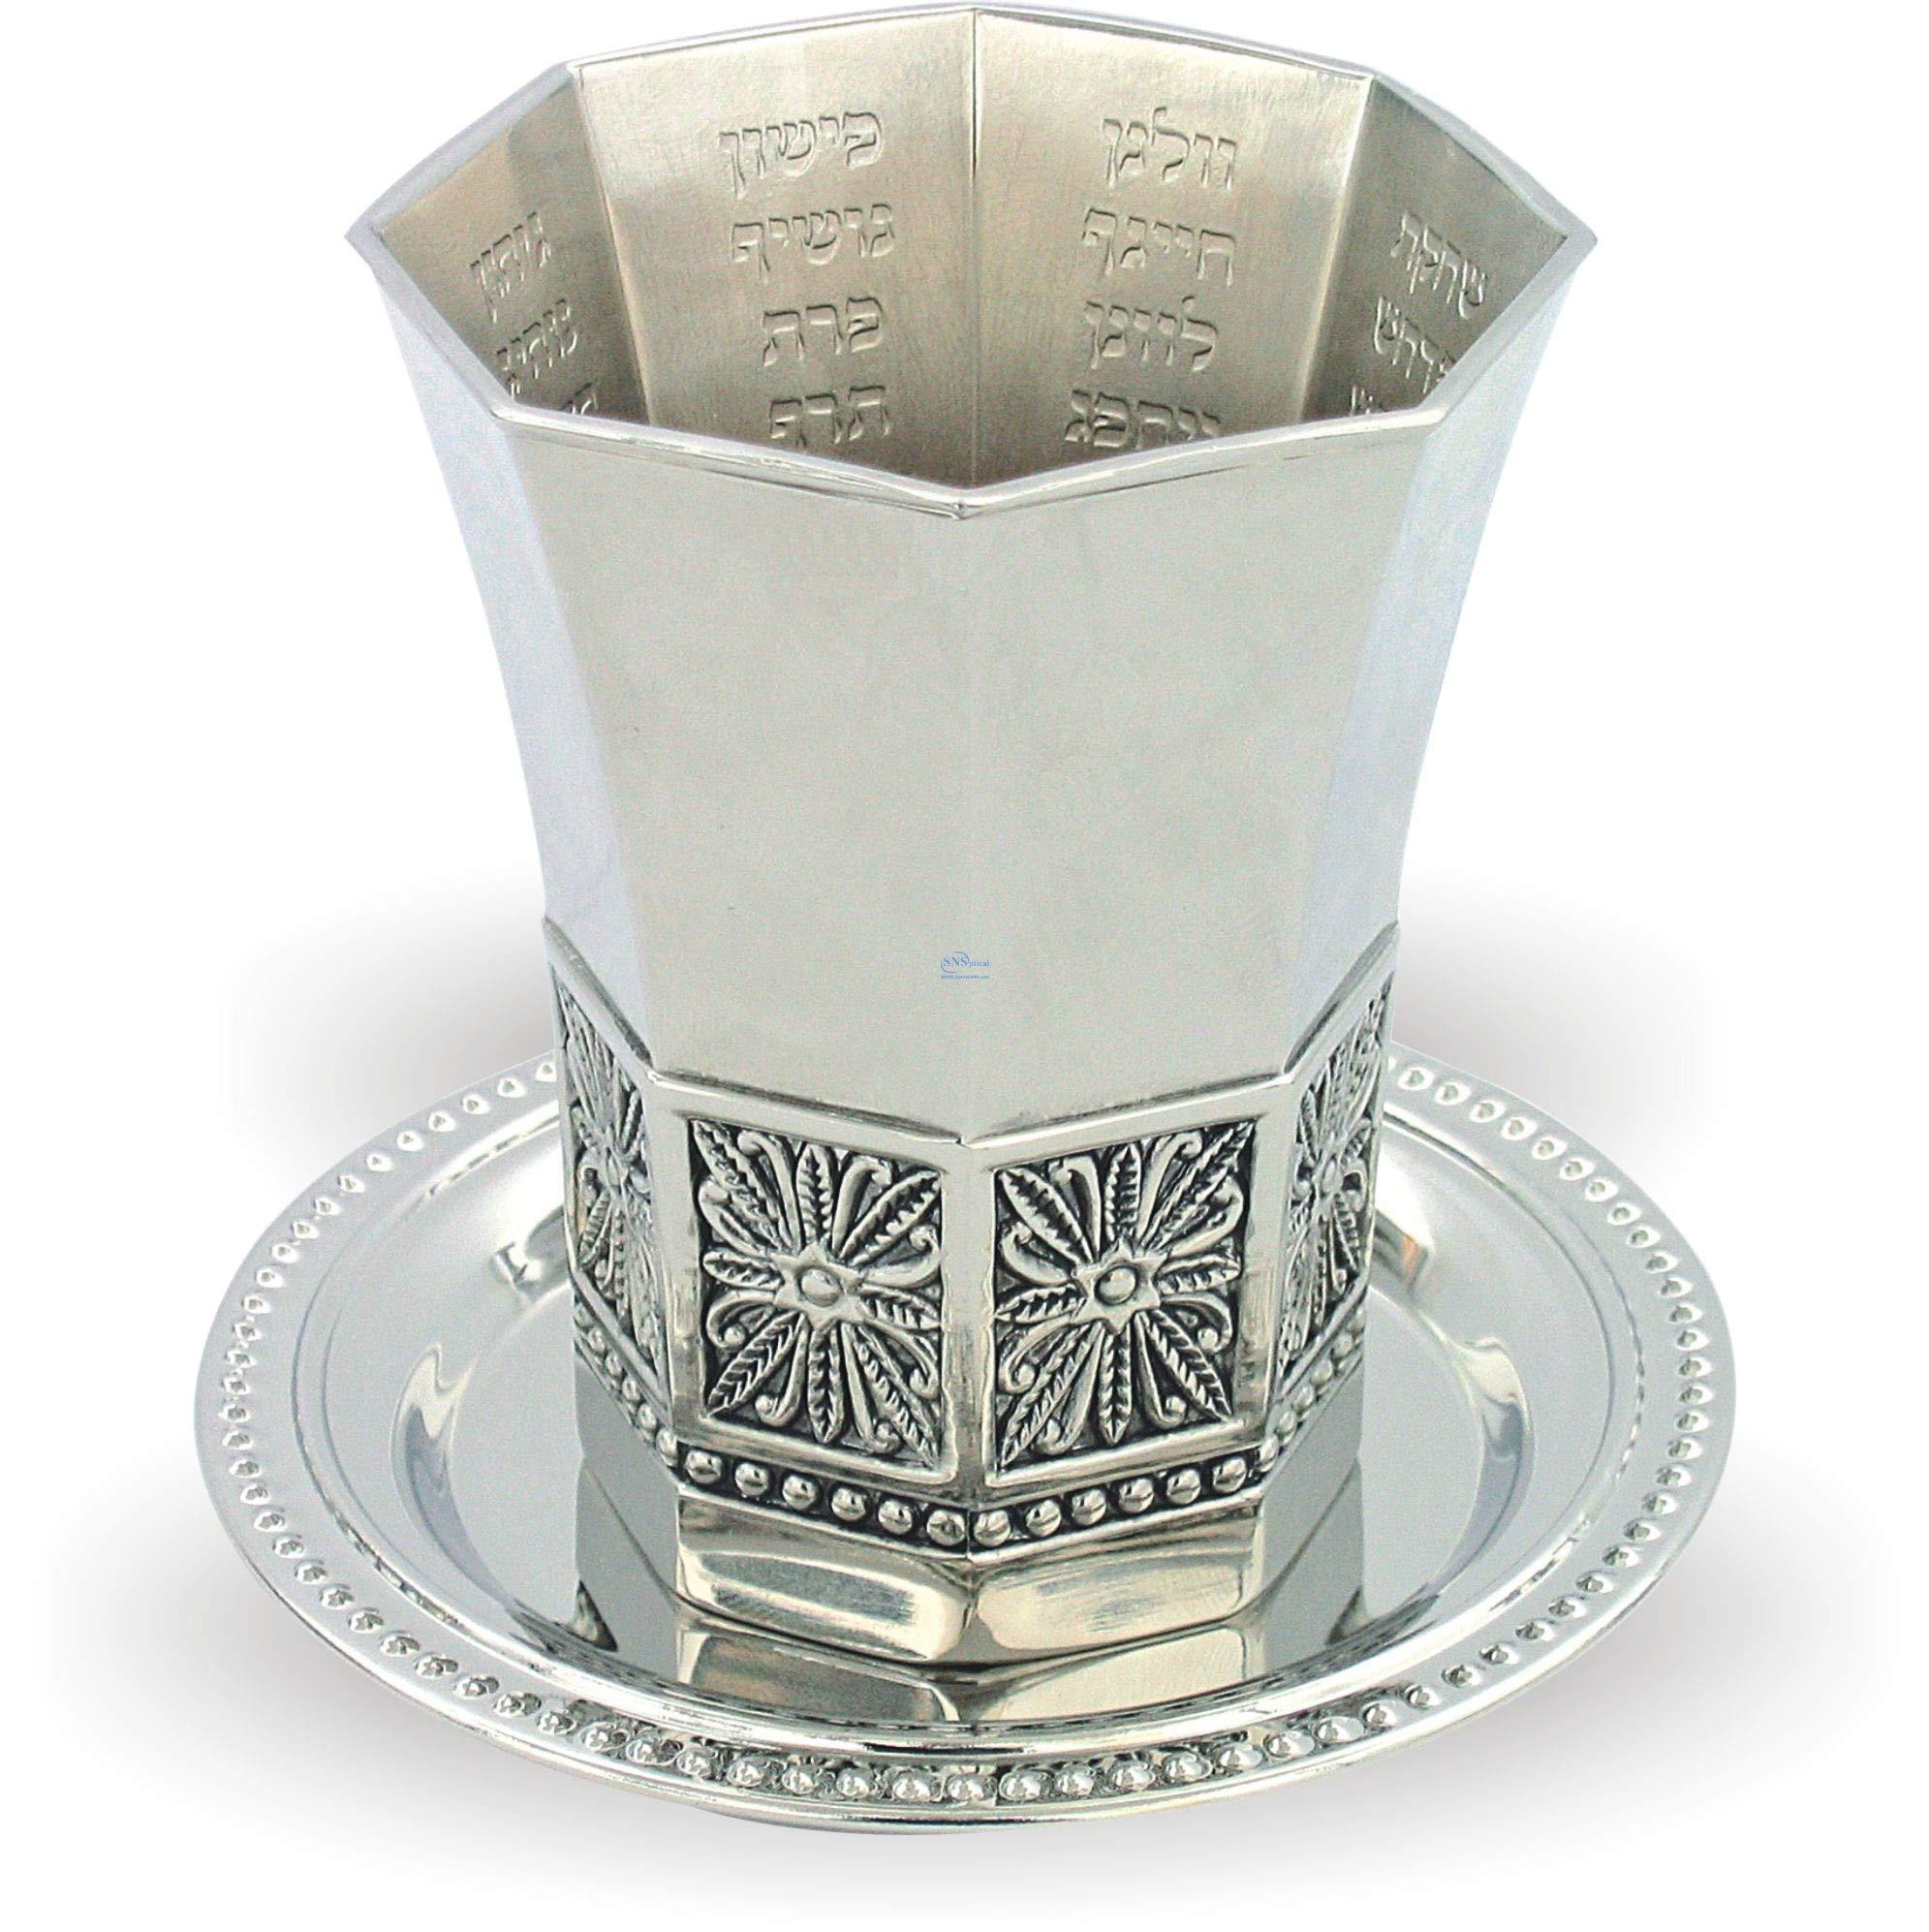 SNSArts & Judaica Beautiful Metal Kiddush Cup -Kabbalah Rivers Motif -Baba Sali by SNSArts (Image #1)